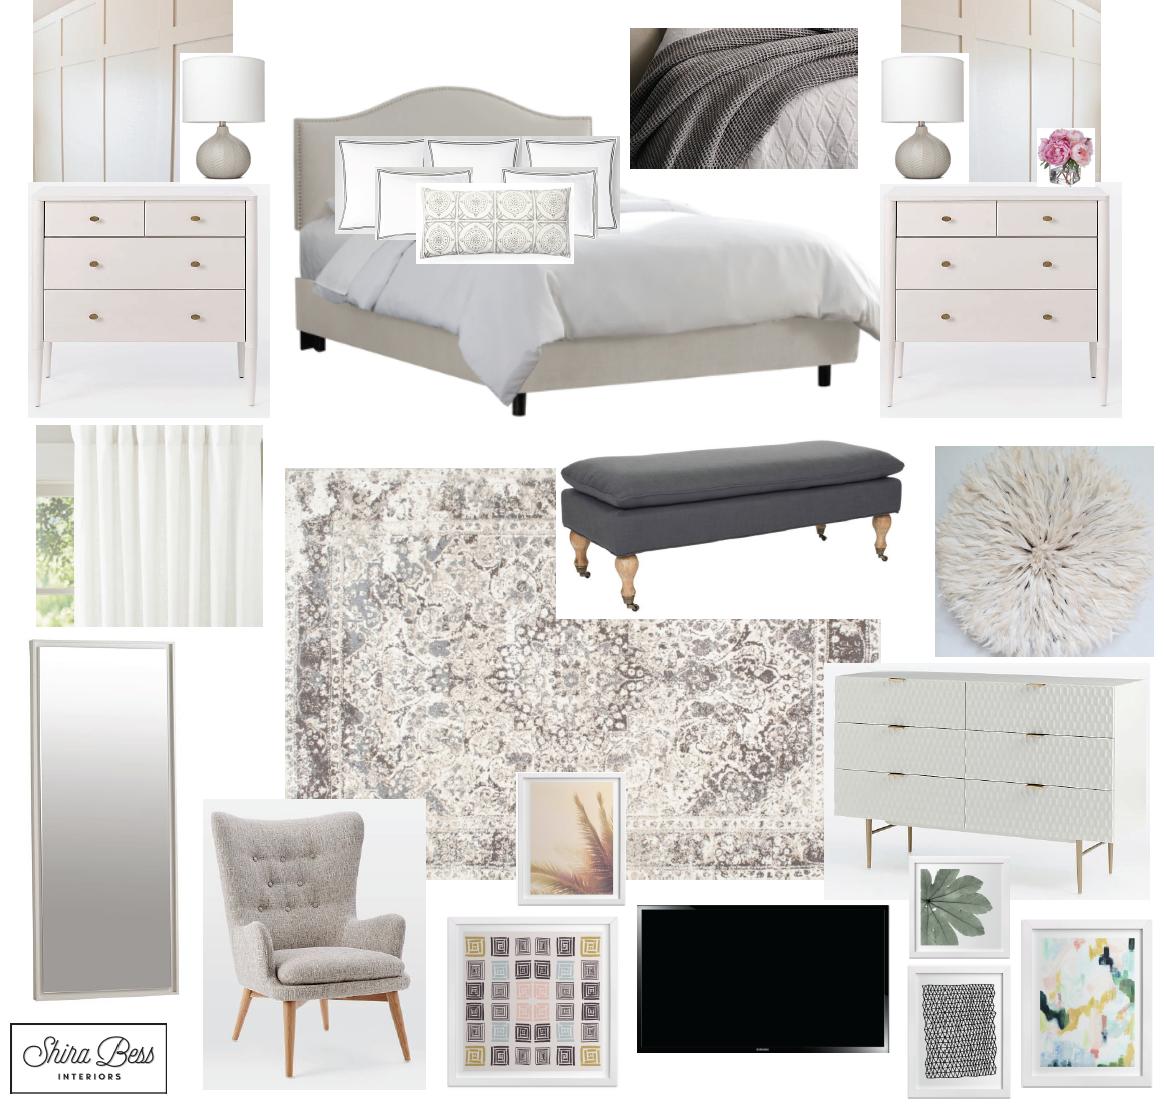 Delray Master Bedroom - Option 2